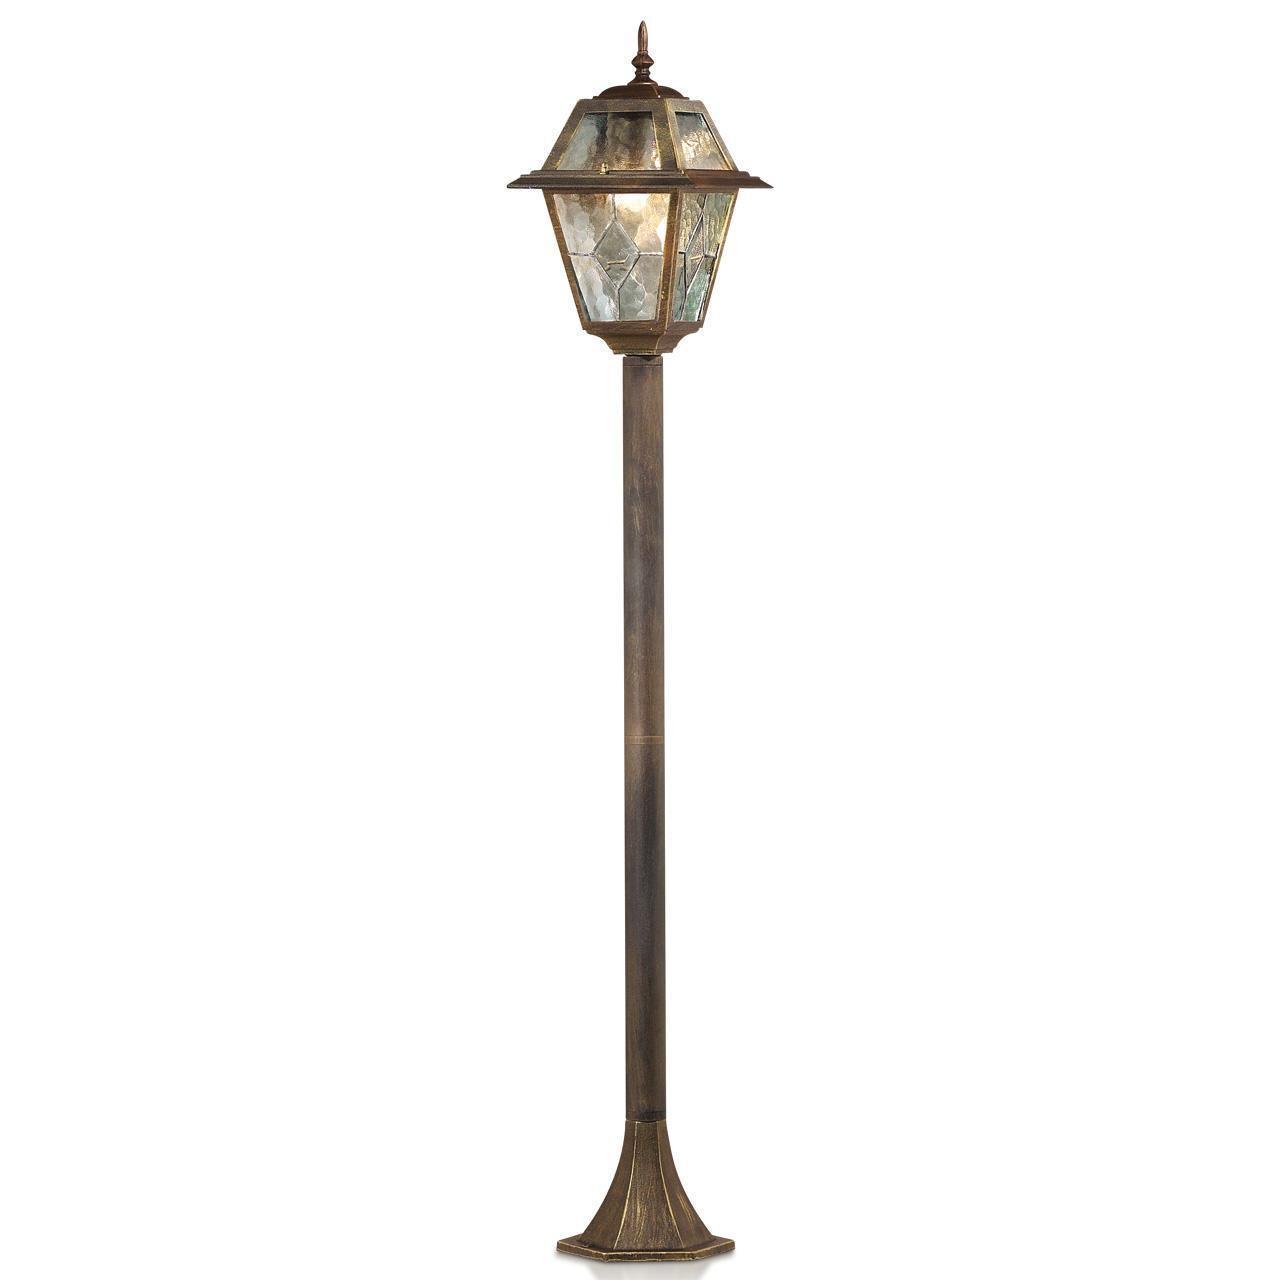 Уличный светильник Odeon Light Outer 2318/1F торшер odeon light glen 2266 1f